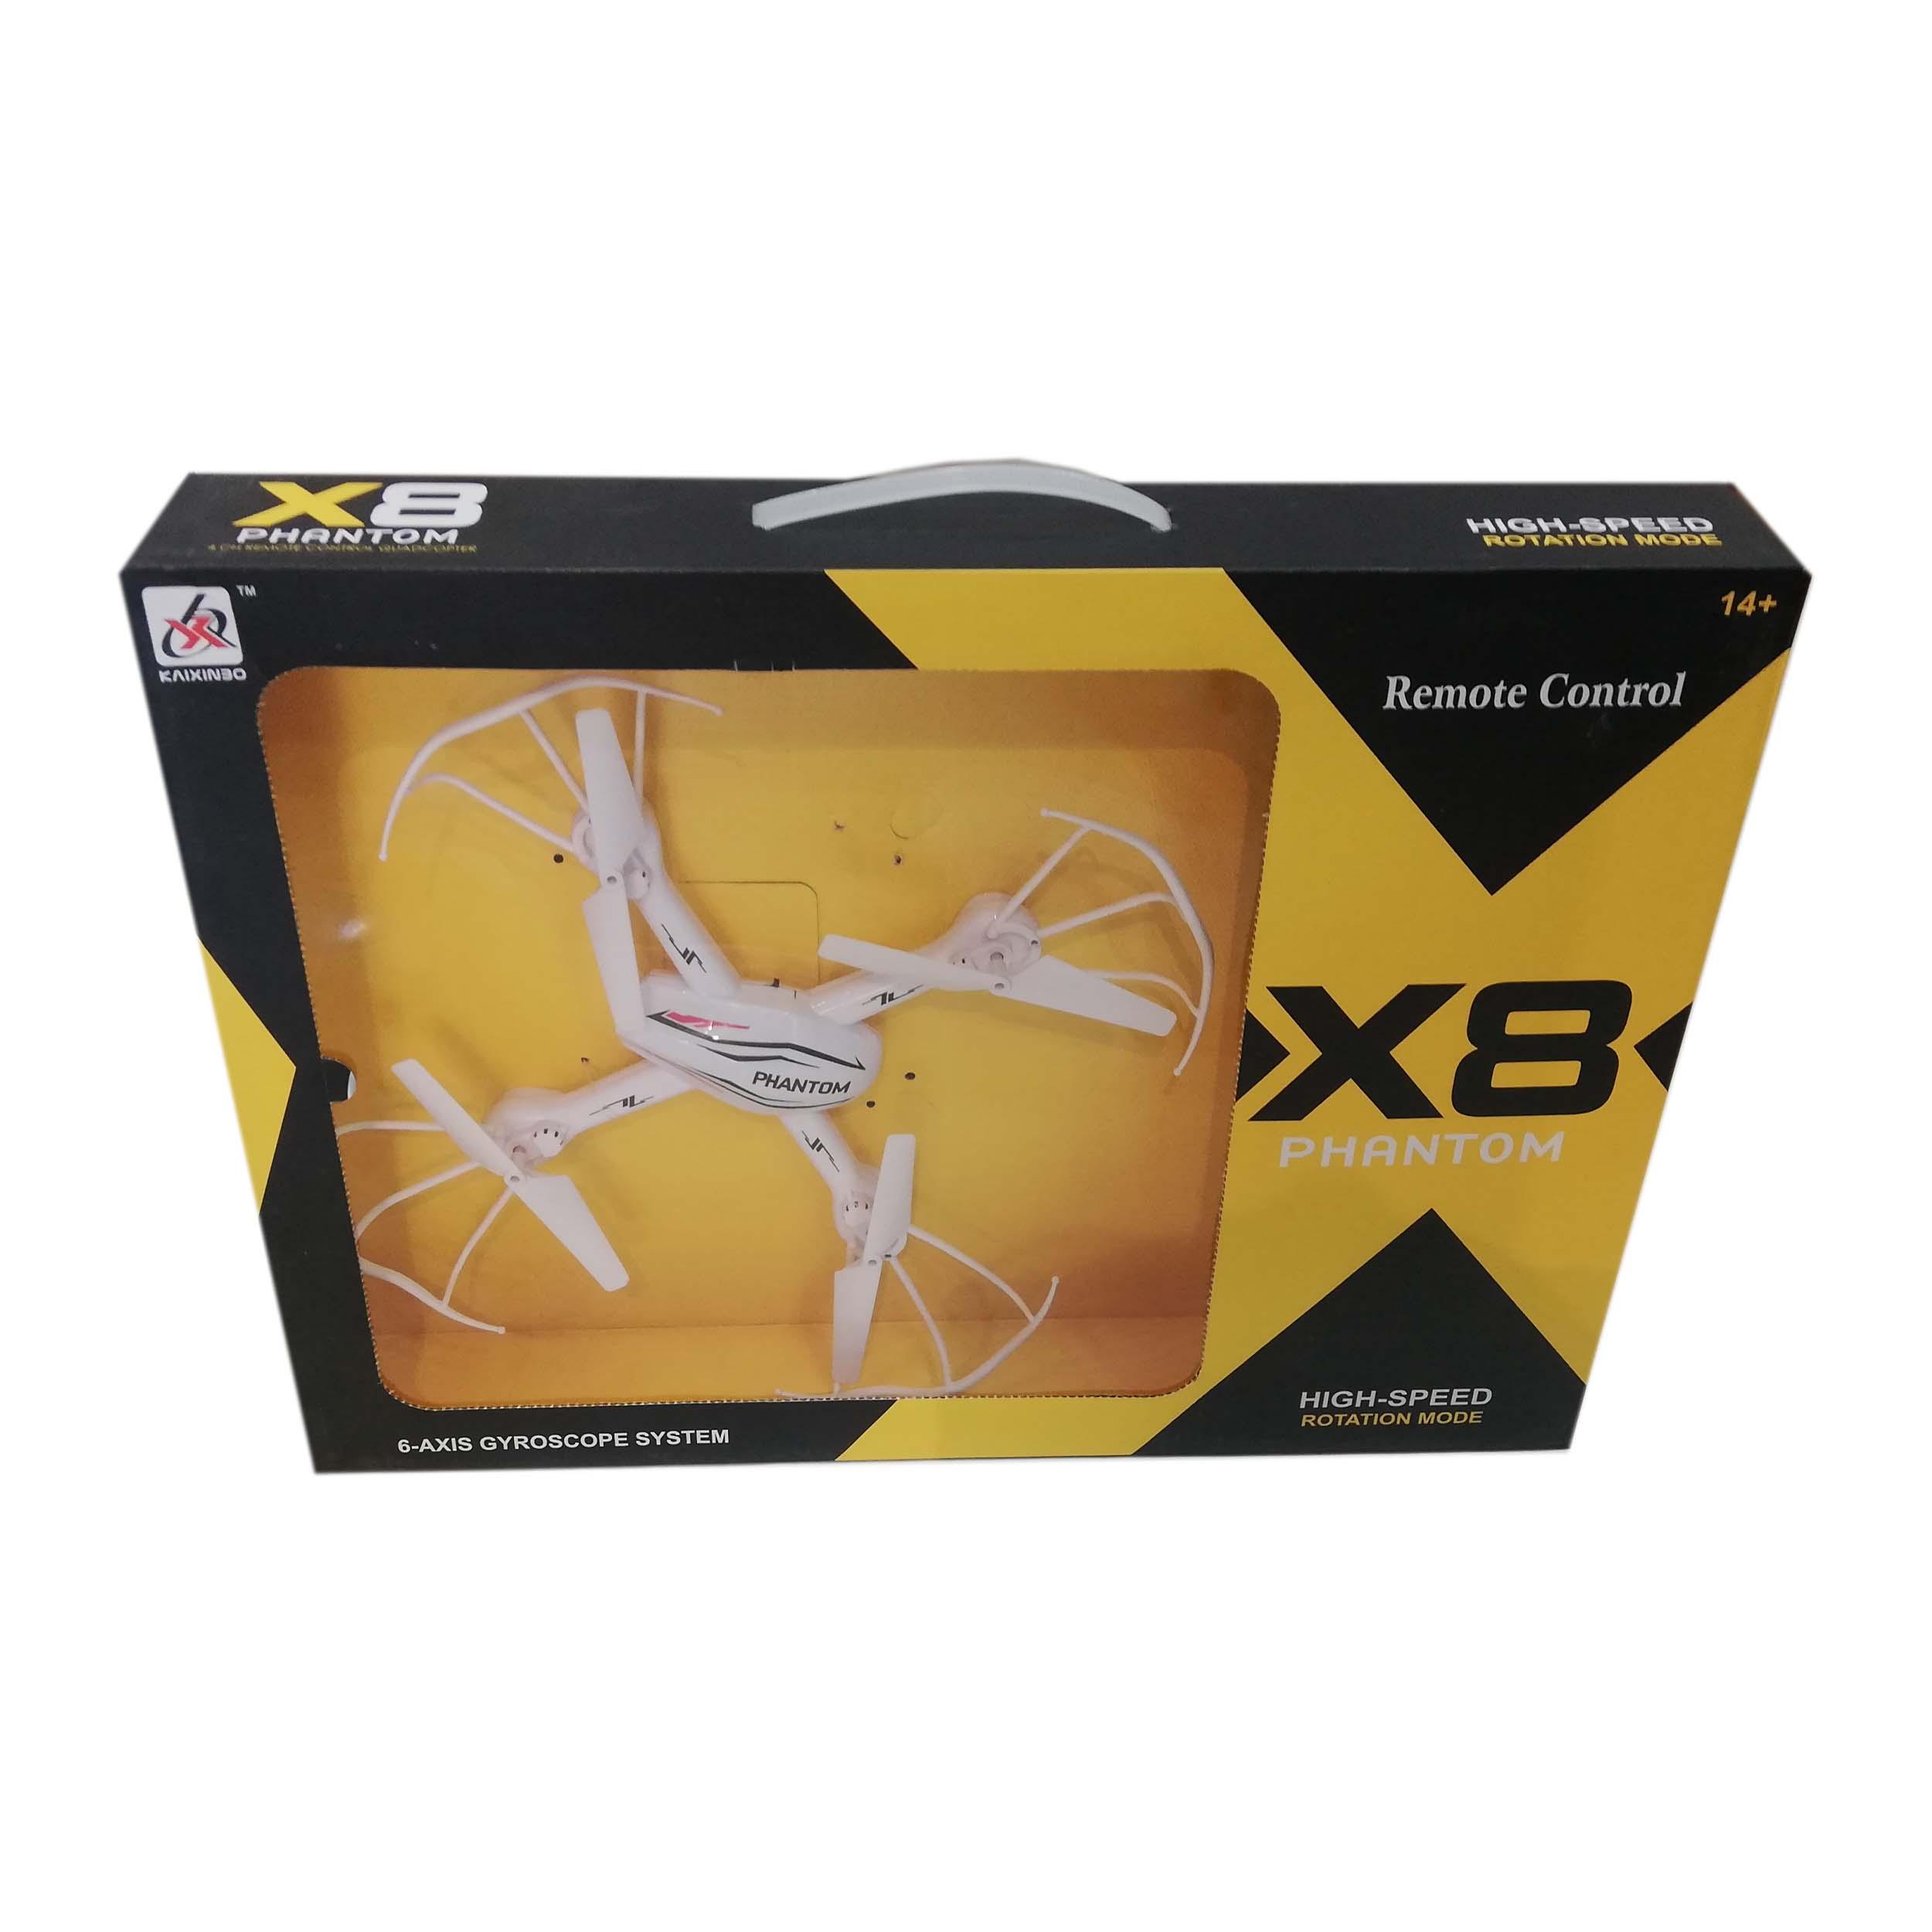 کواد کوپتر کنترلی مدل x8